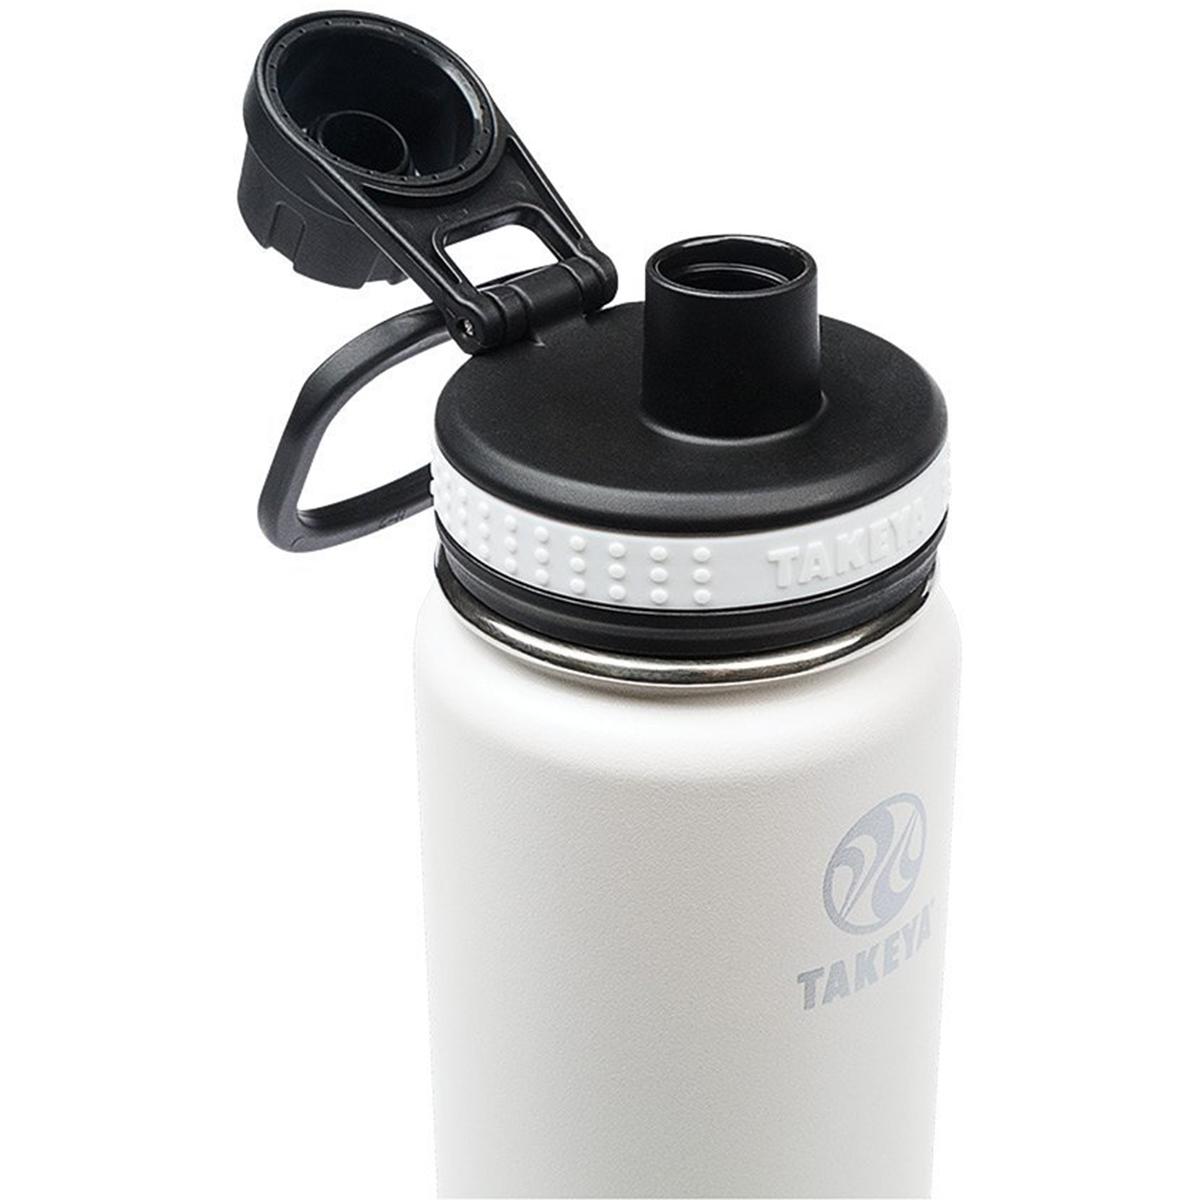 Takeya Originals 18 oz Insulated Stainless Steel Water Bottle